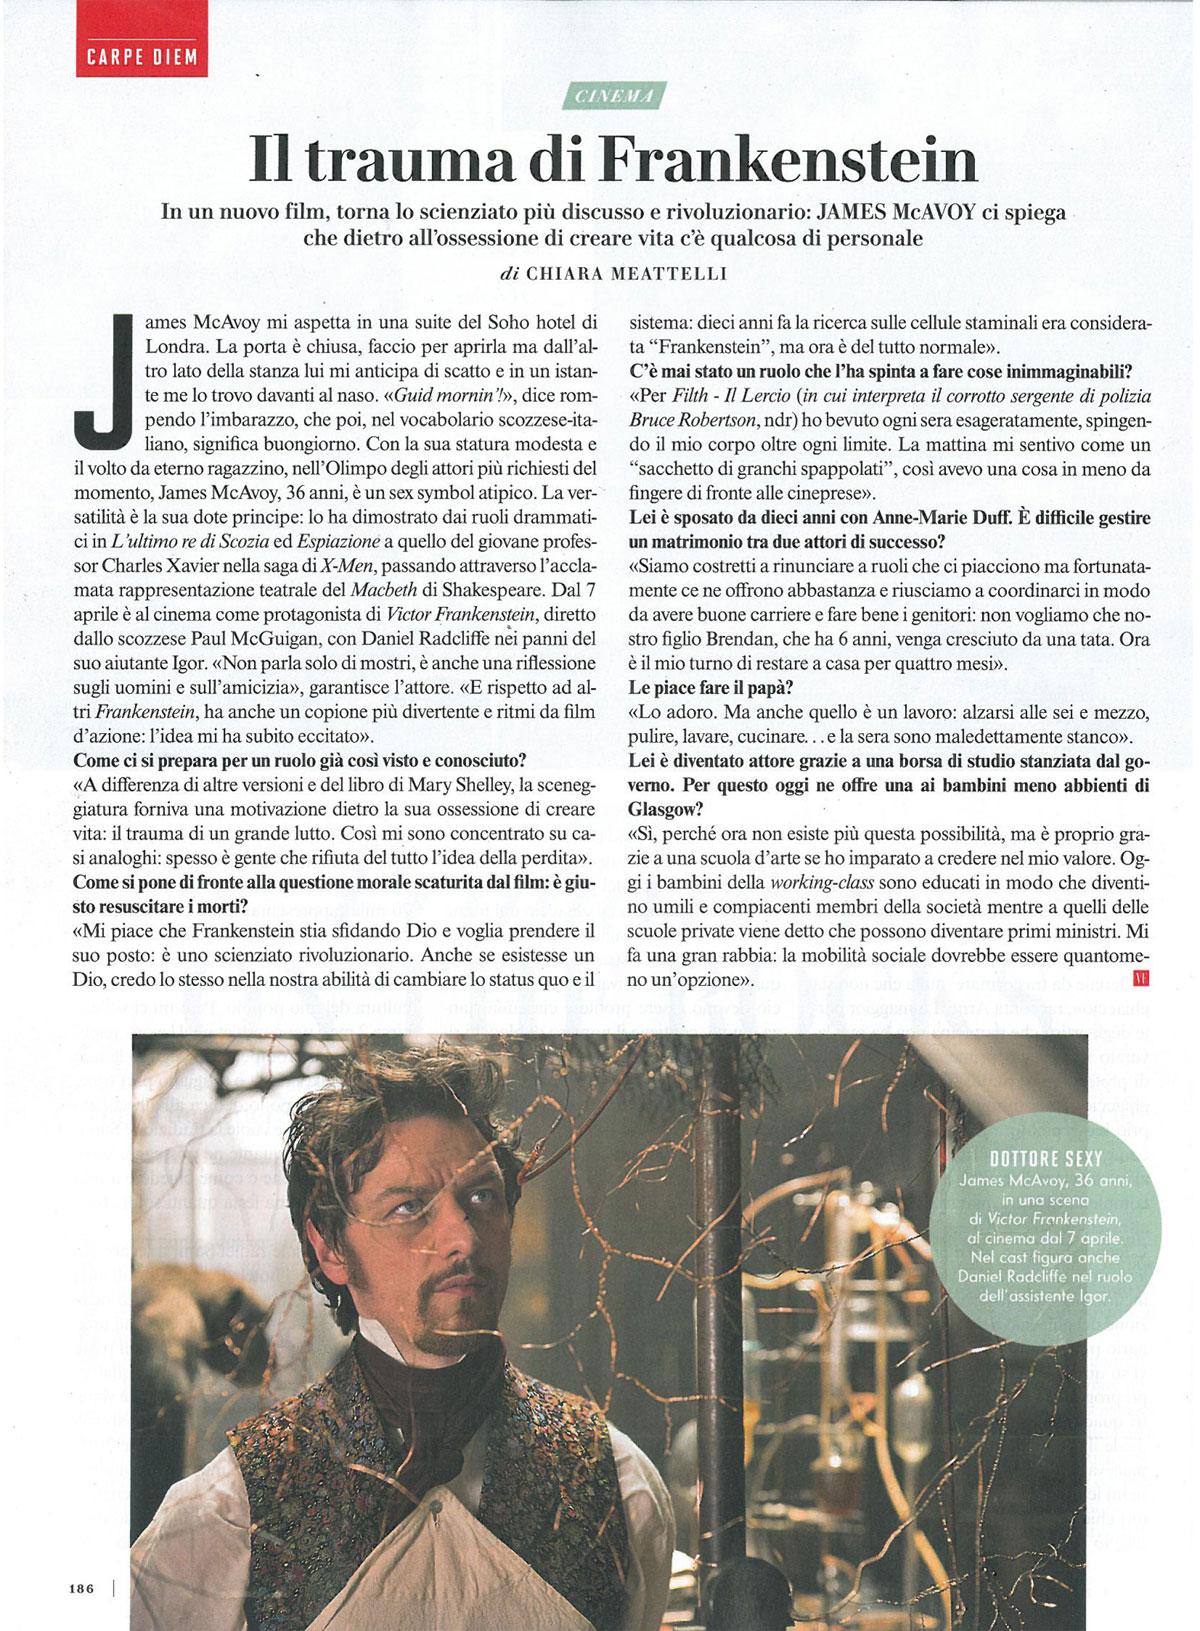 Vanity Fair: James McAvoy interview